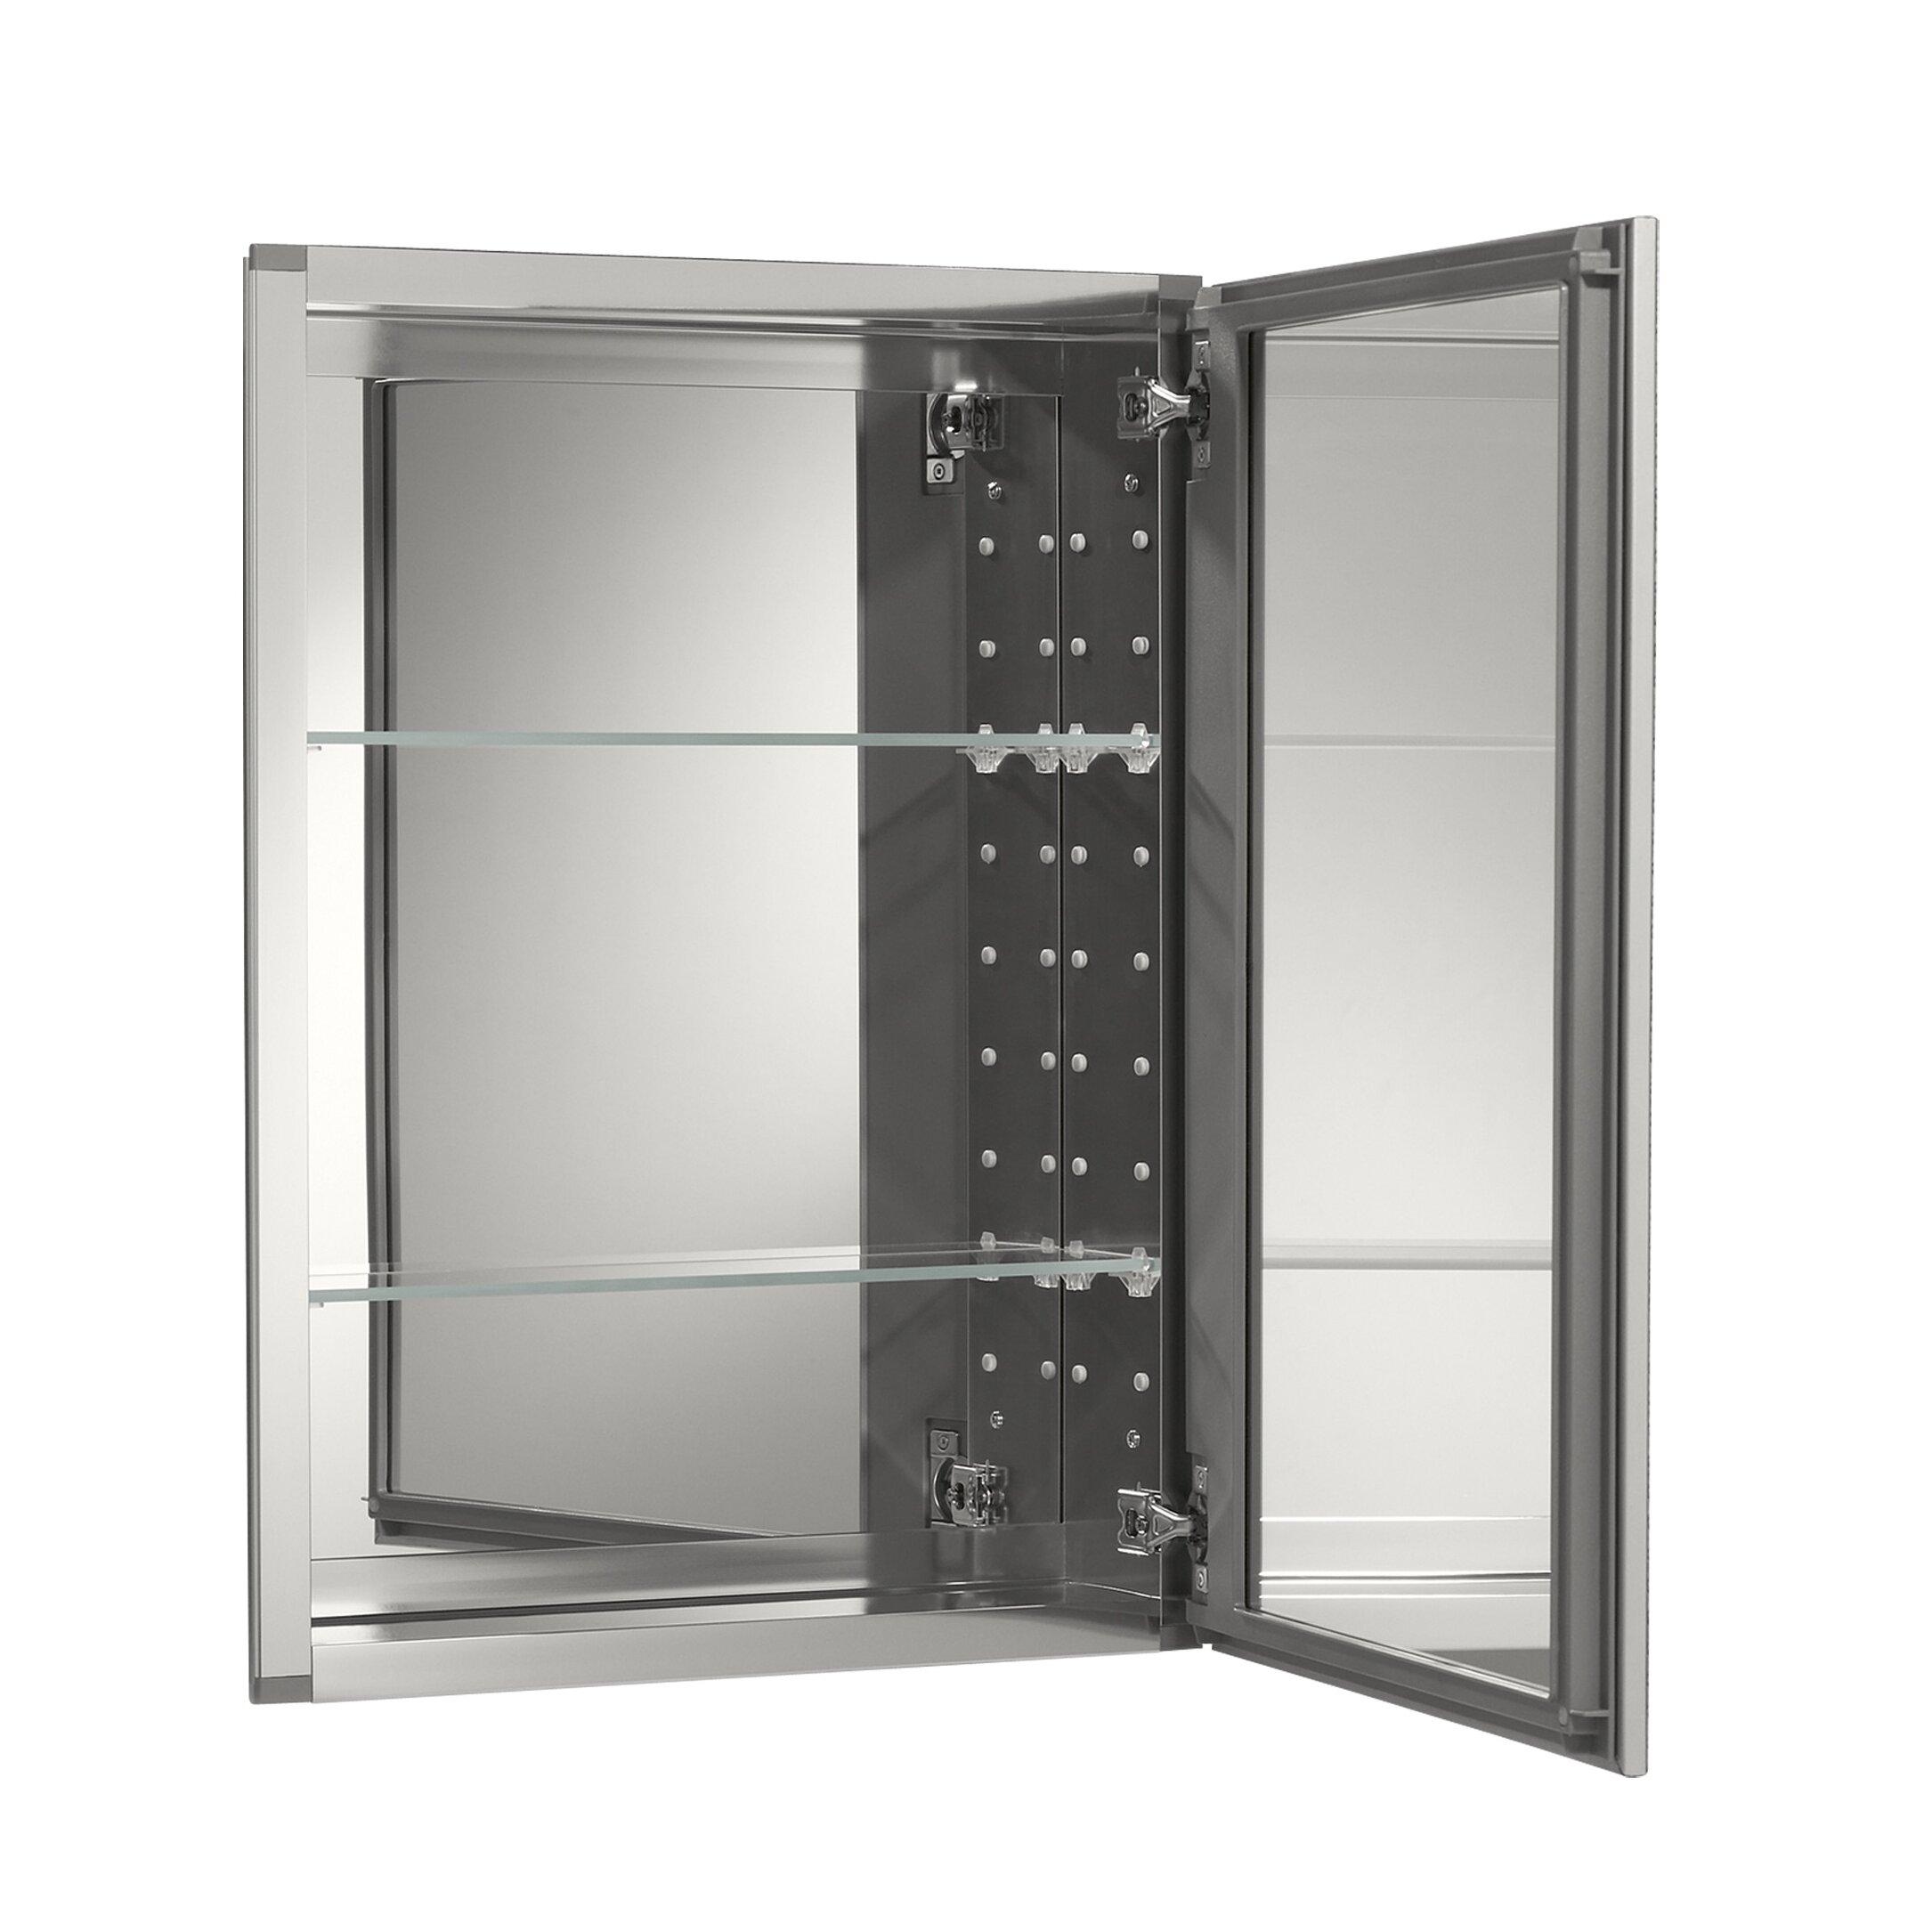 Kohler 20 X 26 Aluminum Mirrored Medicine Cabinet Reviews Wayfair